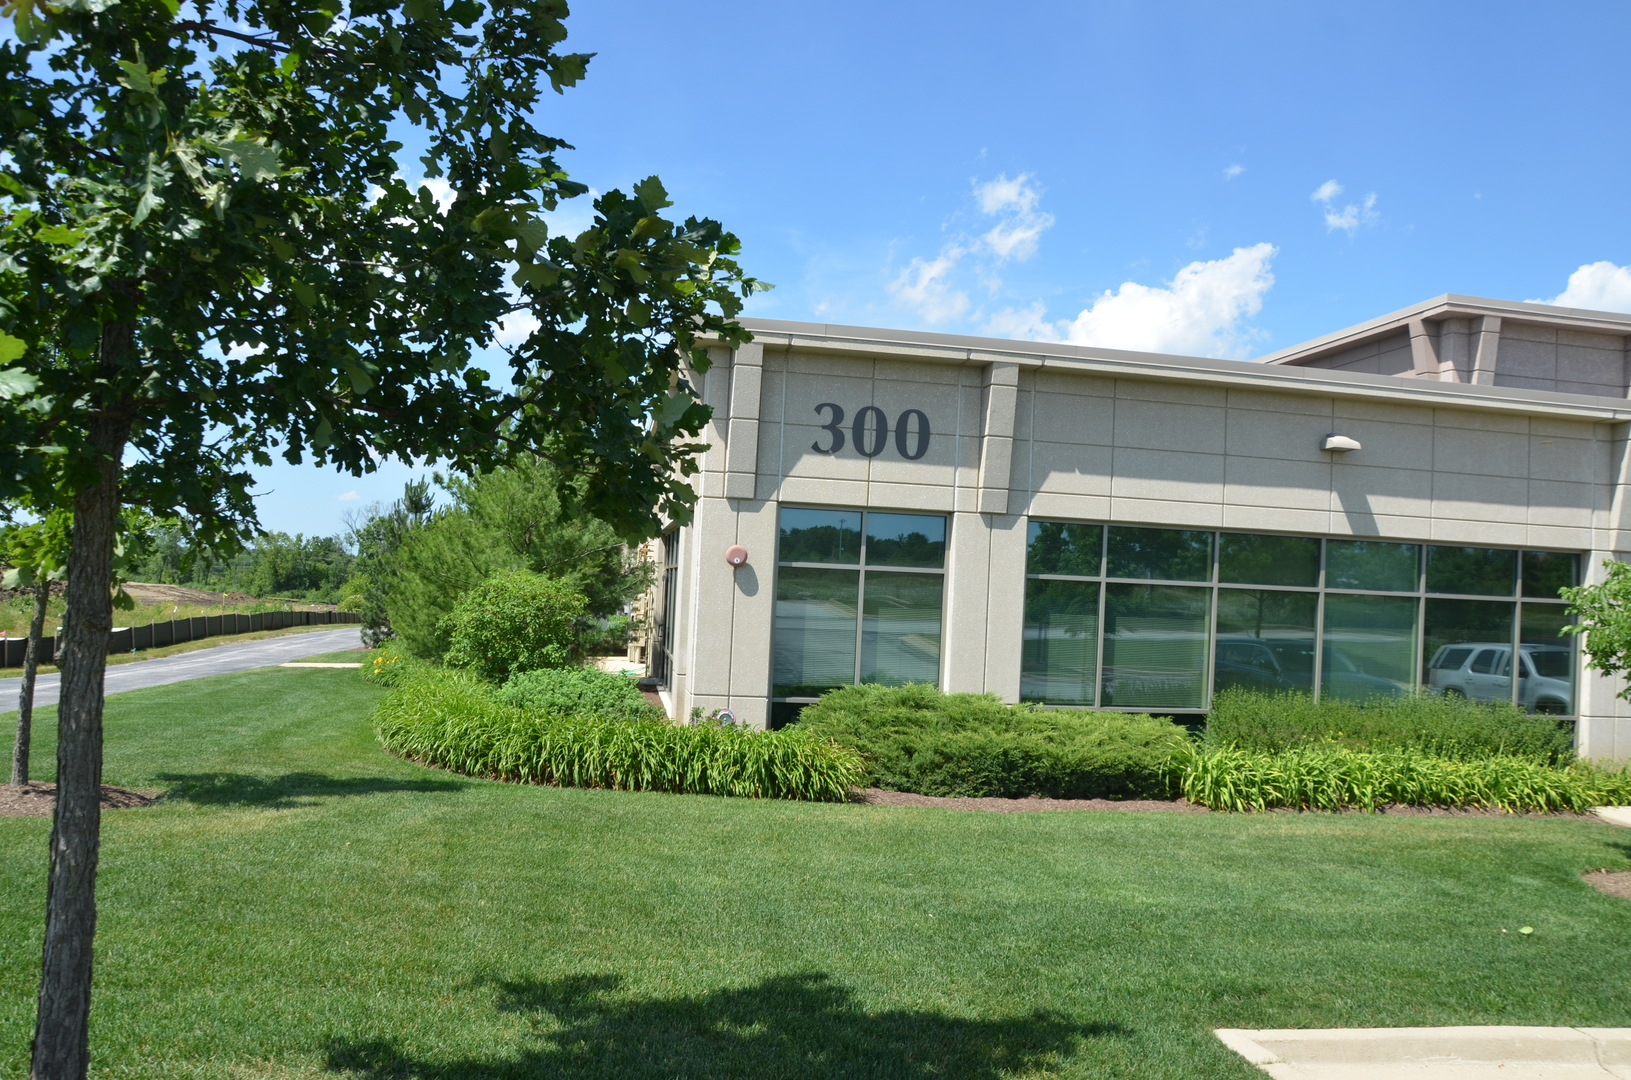 320 Cardinal Unit Unit 480 ,St. Charles, Illinois 60175